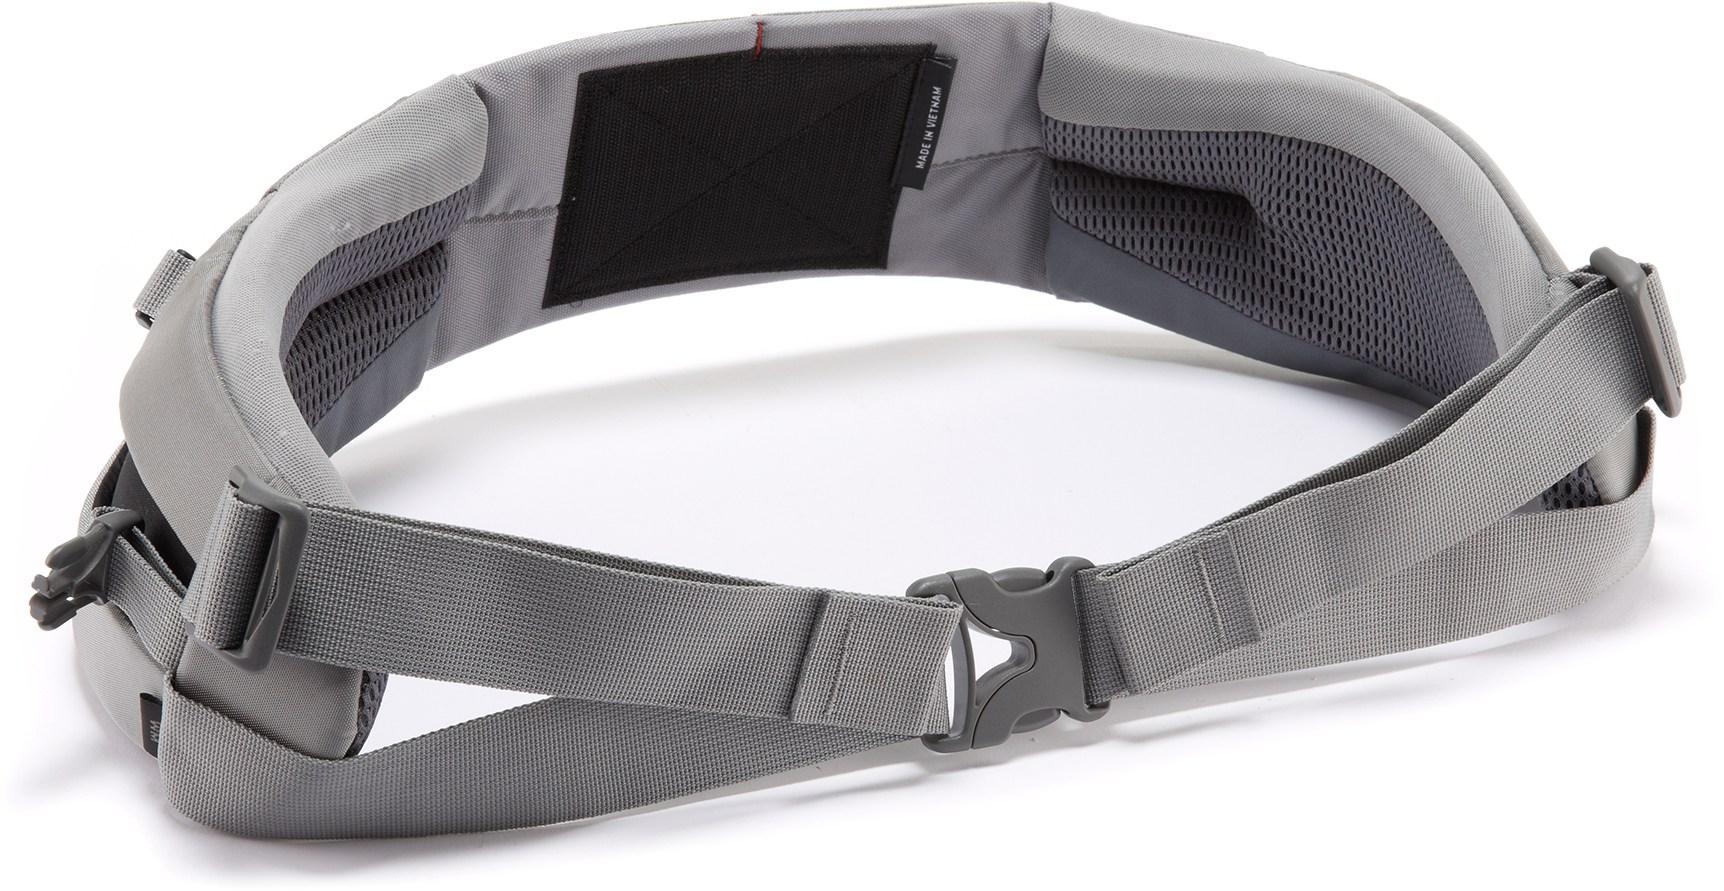 Cinturón lumbar IsoForm en mochilas Osprey